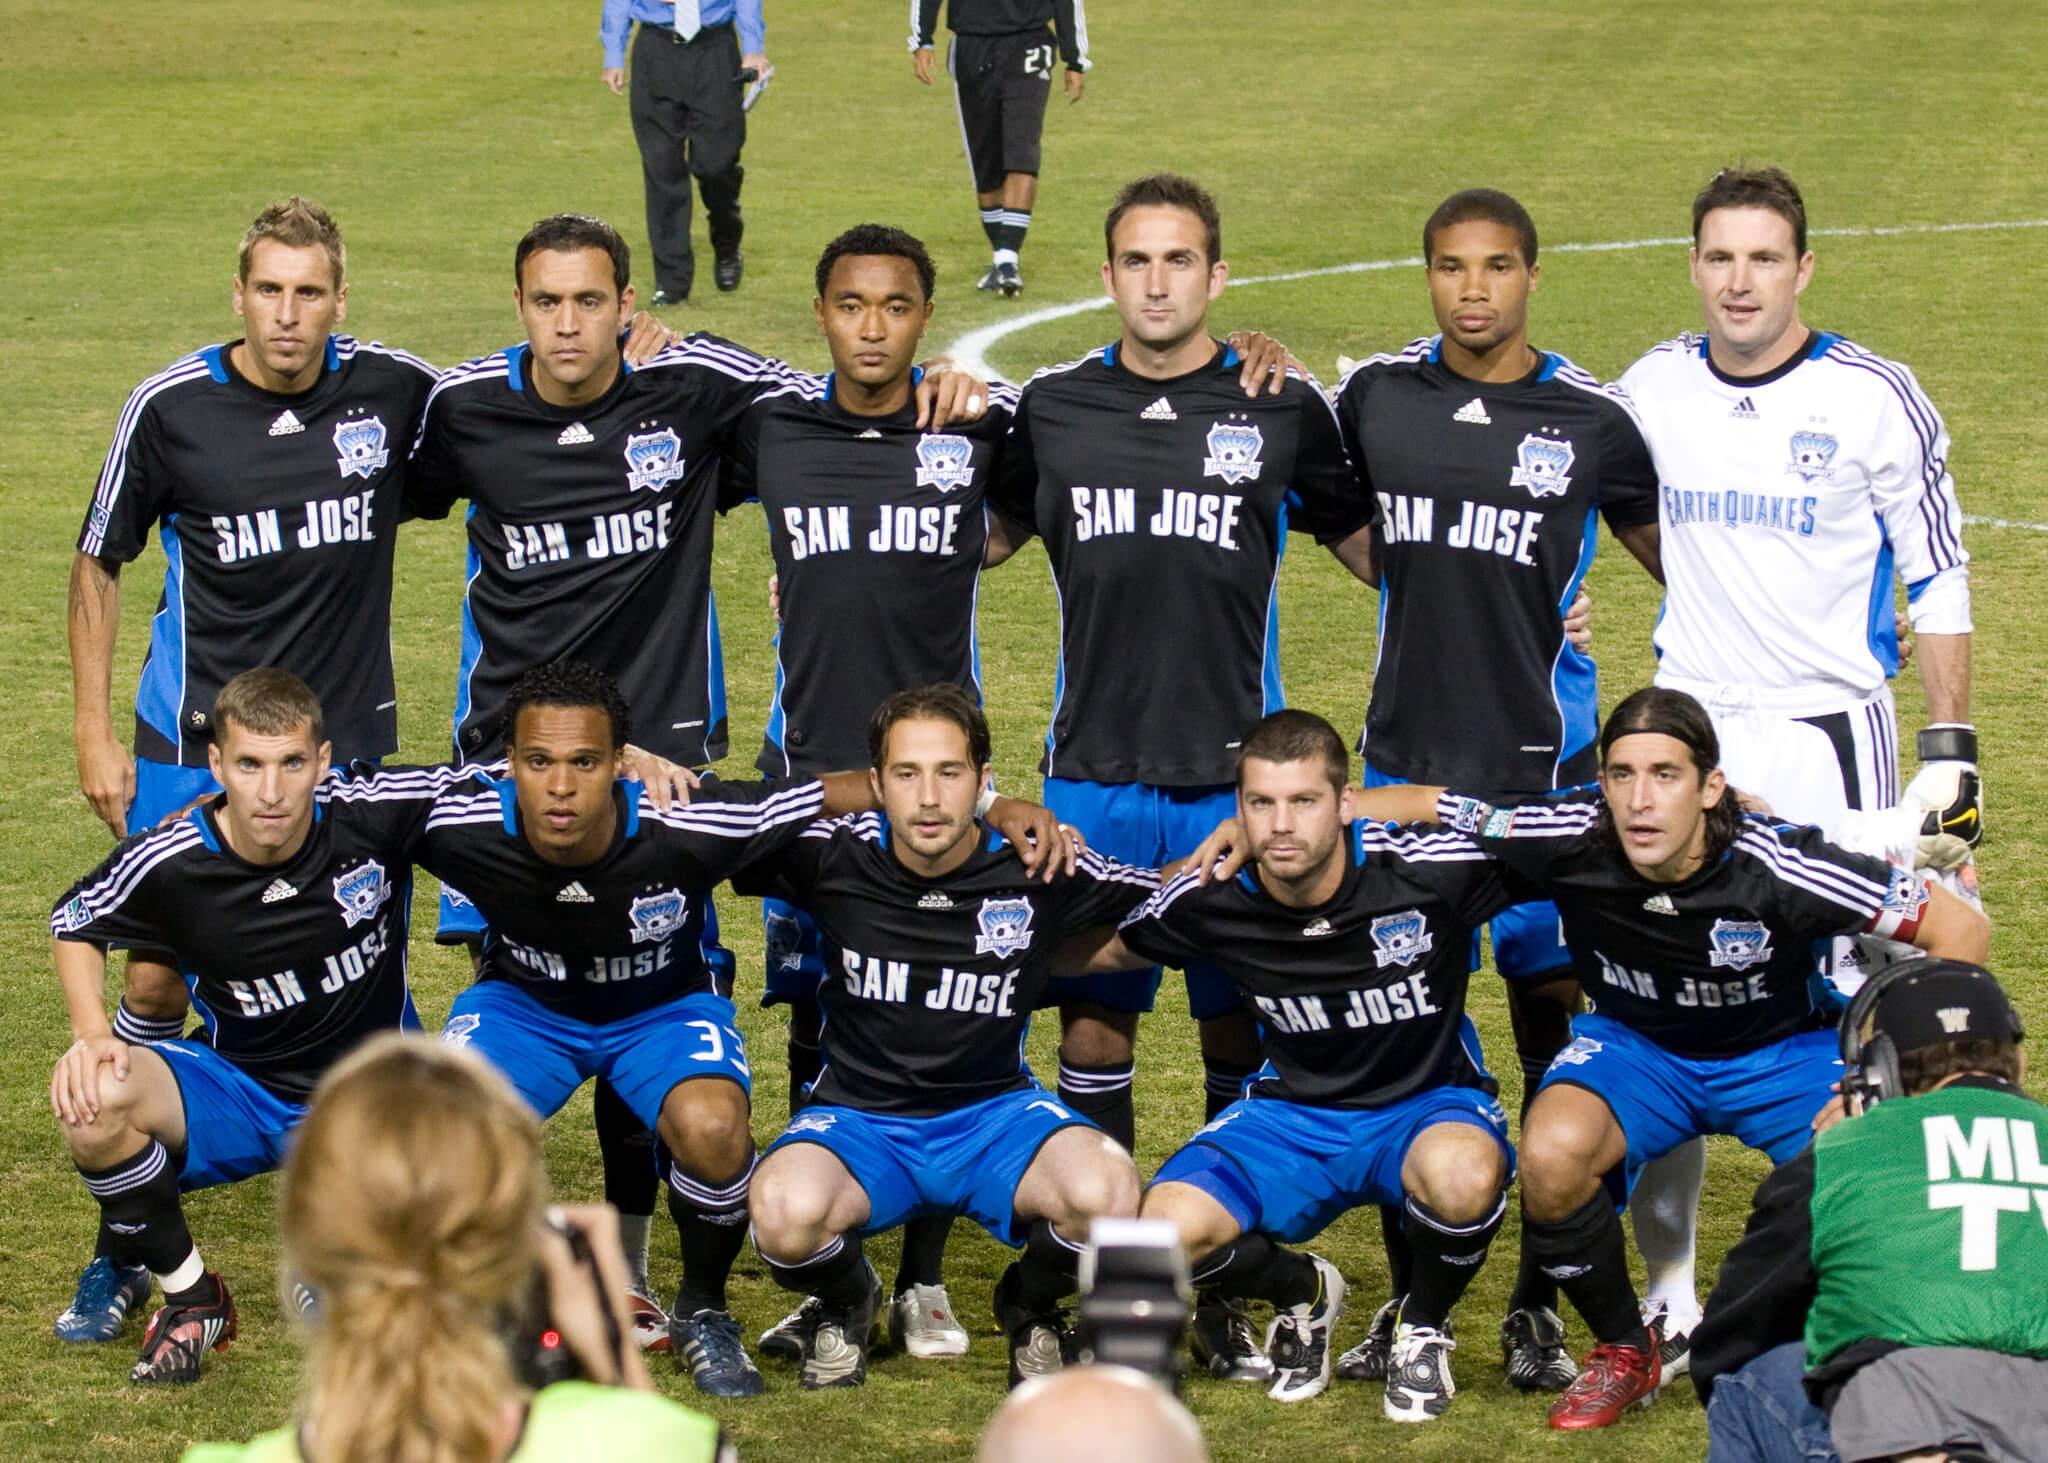 San Jose Earthquakes soccer players